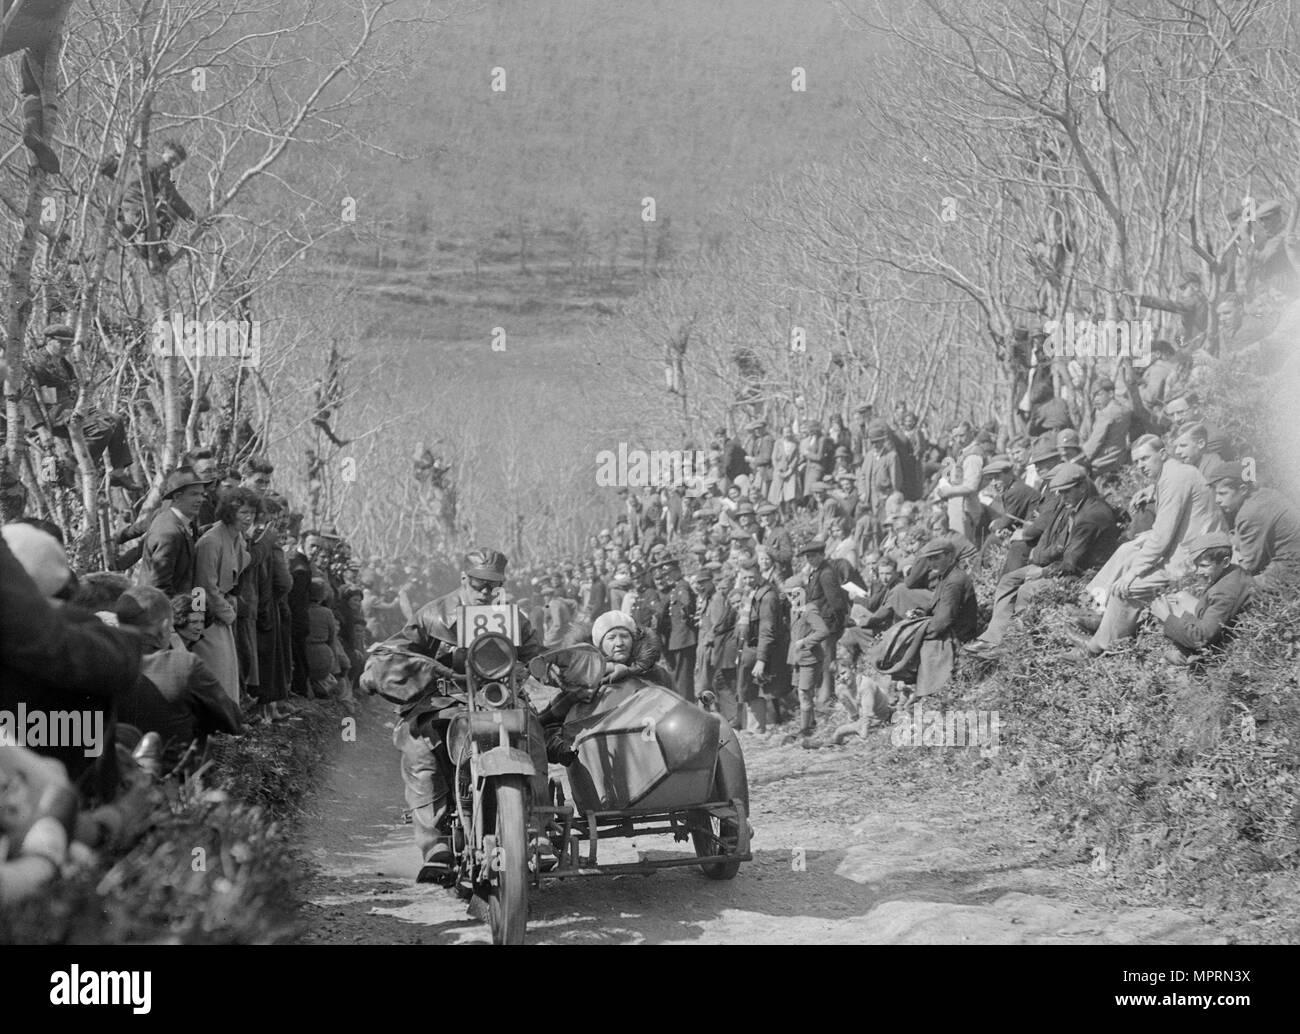 Harley-Davidson of RW Praill, MCC Lands End Trial, Hustyn Hill, Wadebridge, Cornwall, 1933. Artist: Bill Brunell. Stock Photo